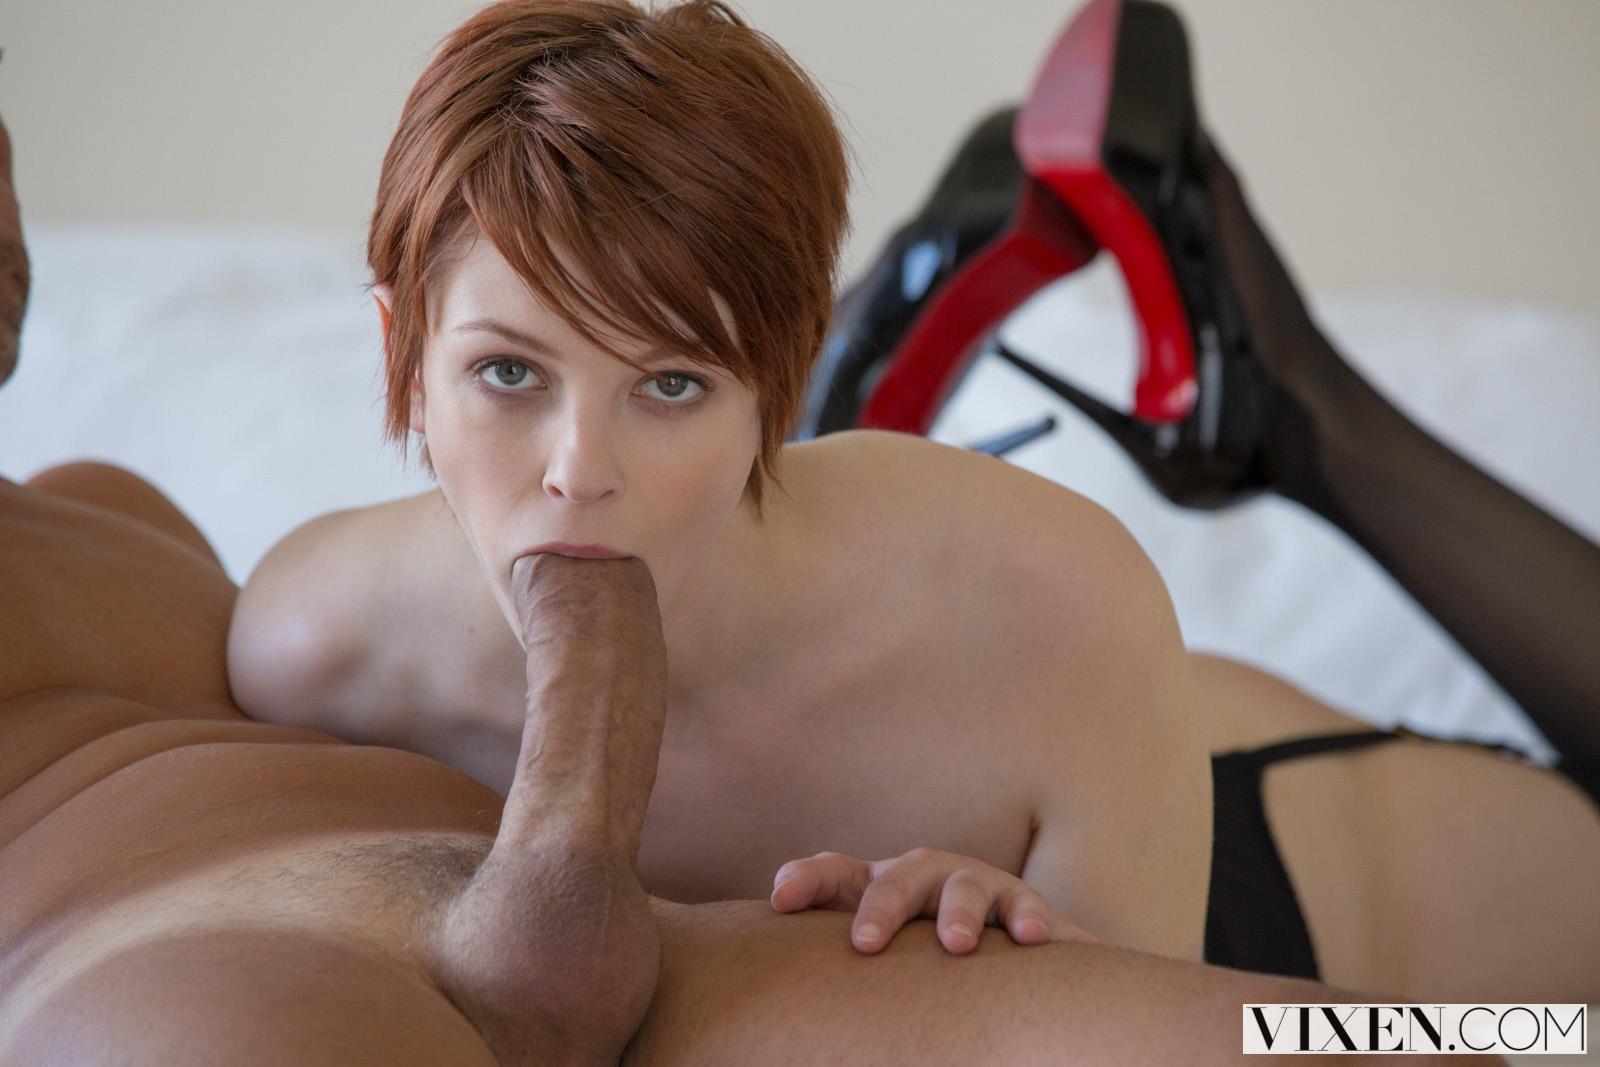 image Vixen beautiful redhead bree daniels fucked by sugar daddy